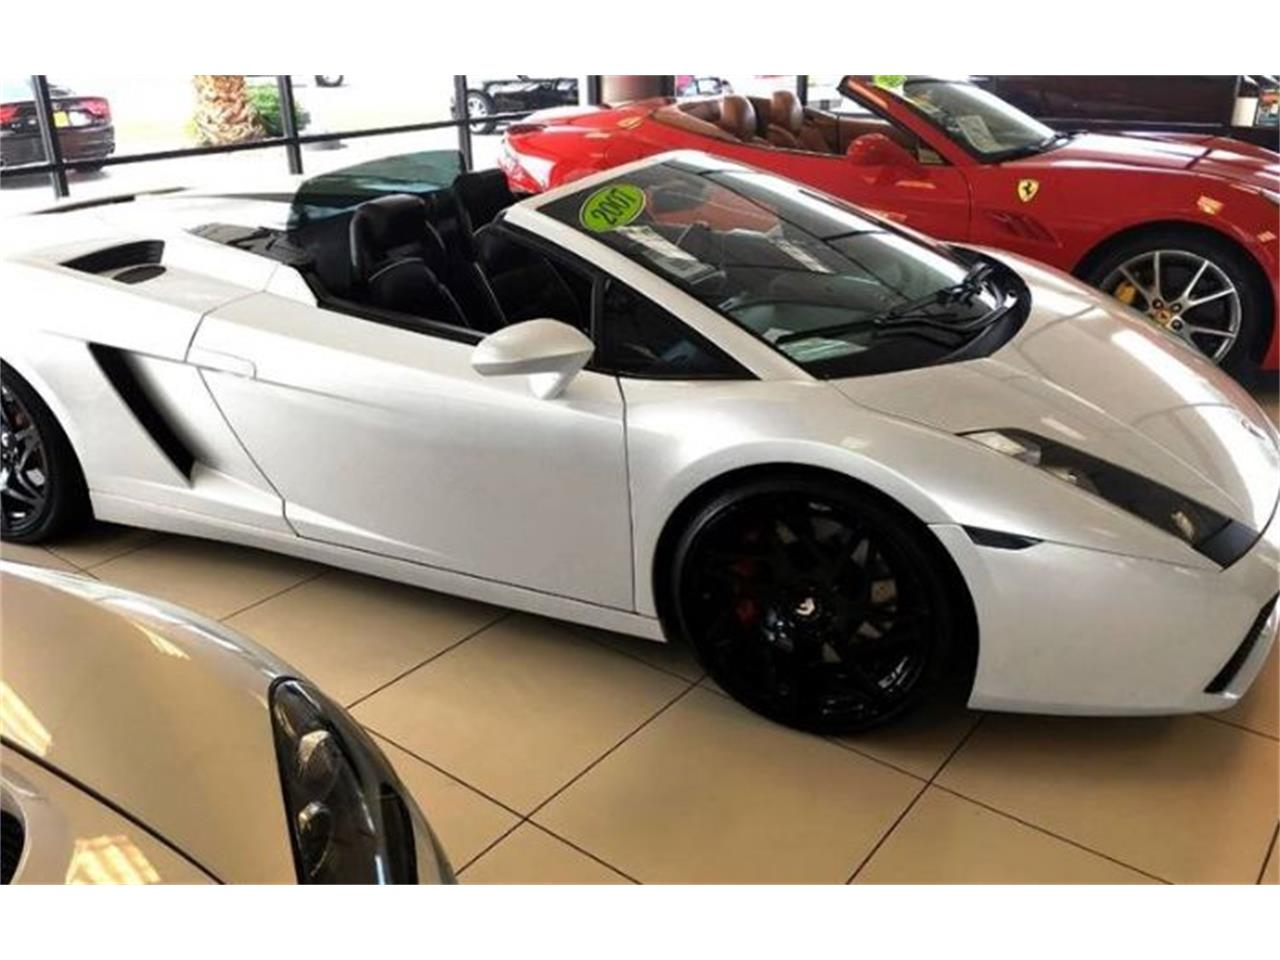 2007 Lamborghini Gallardo For Sale Classiccars Com Cc 1185085